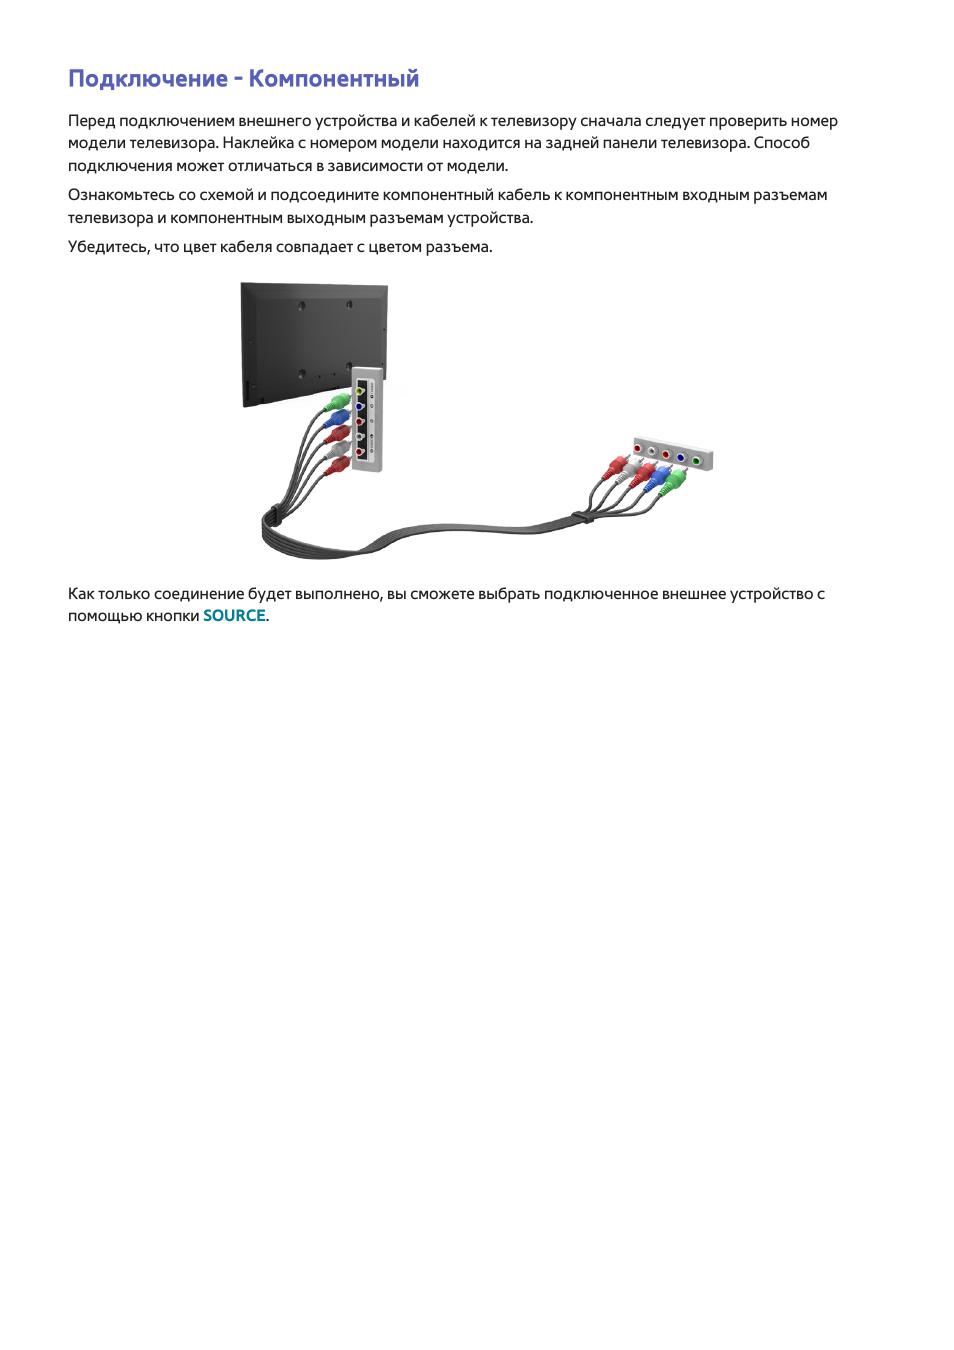 15 подключение - компонентный, Подключение - компонентный Инструкция по эксплуатации Samsung UE55HU8700T Страница 21 / 240